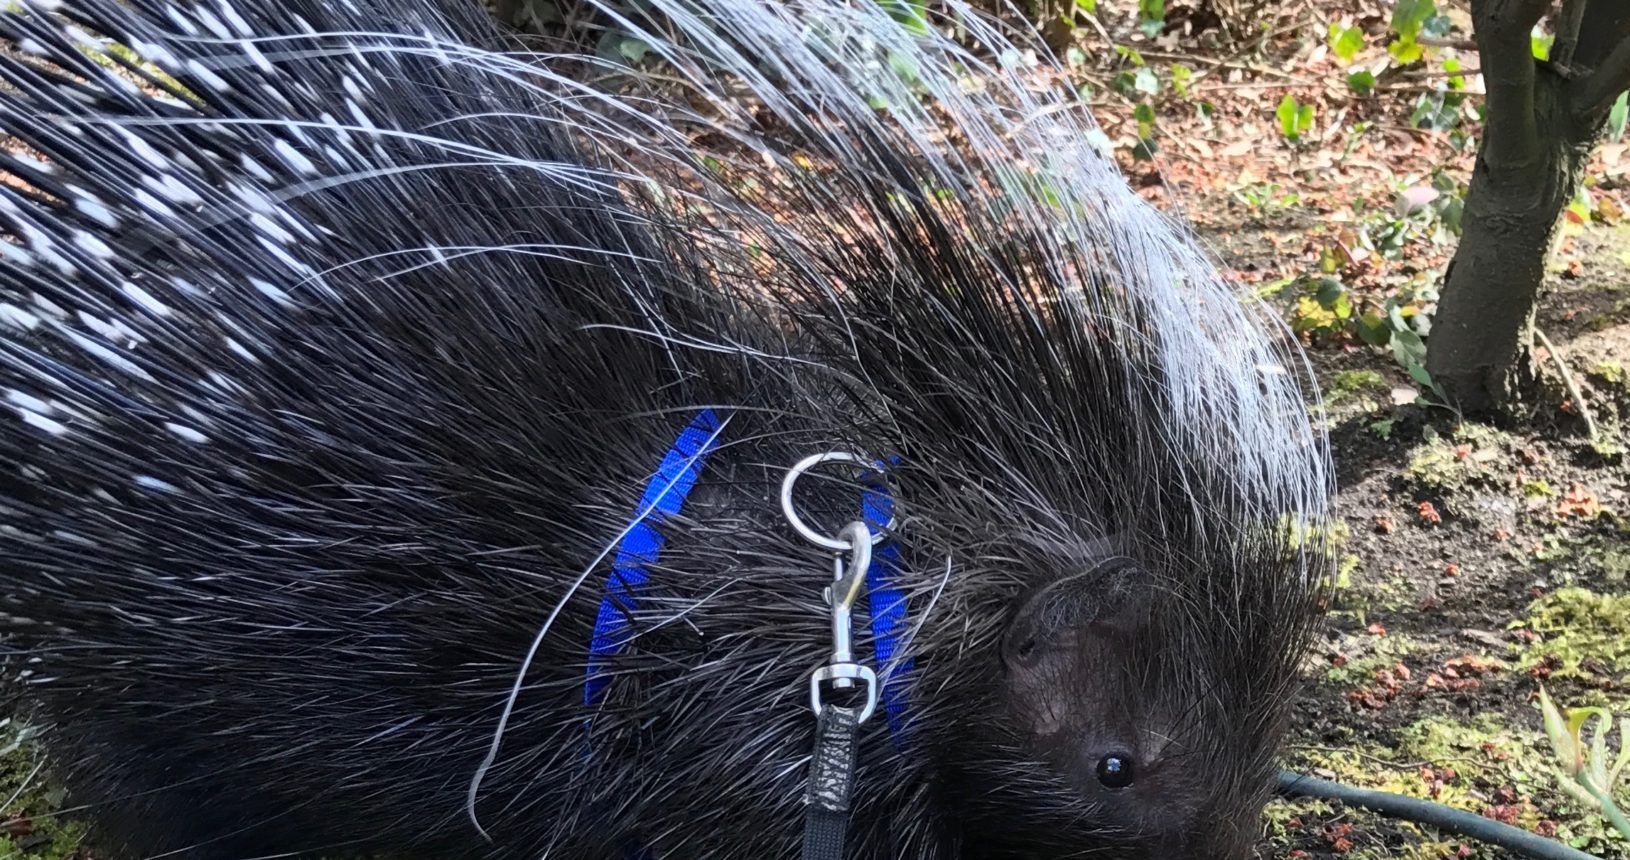 Pike the Porcupine